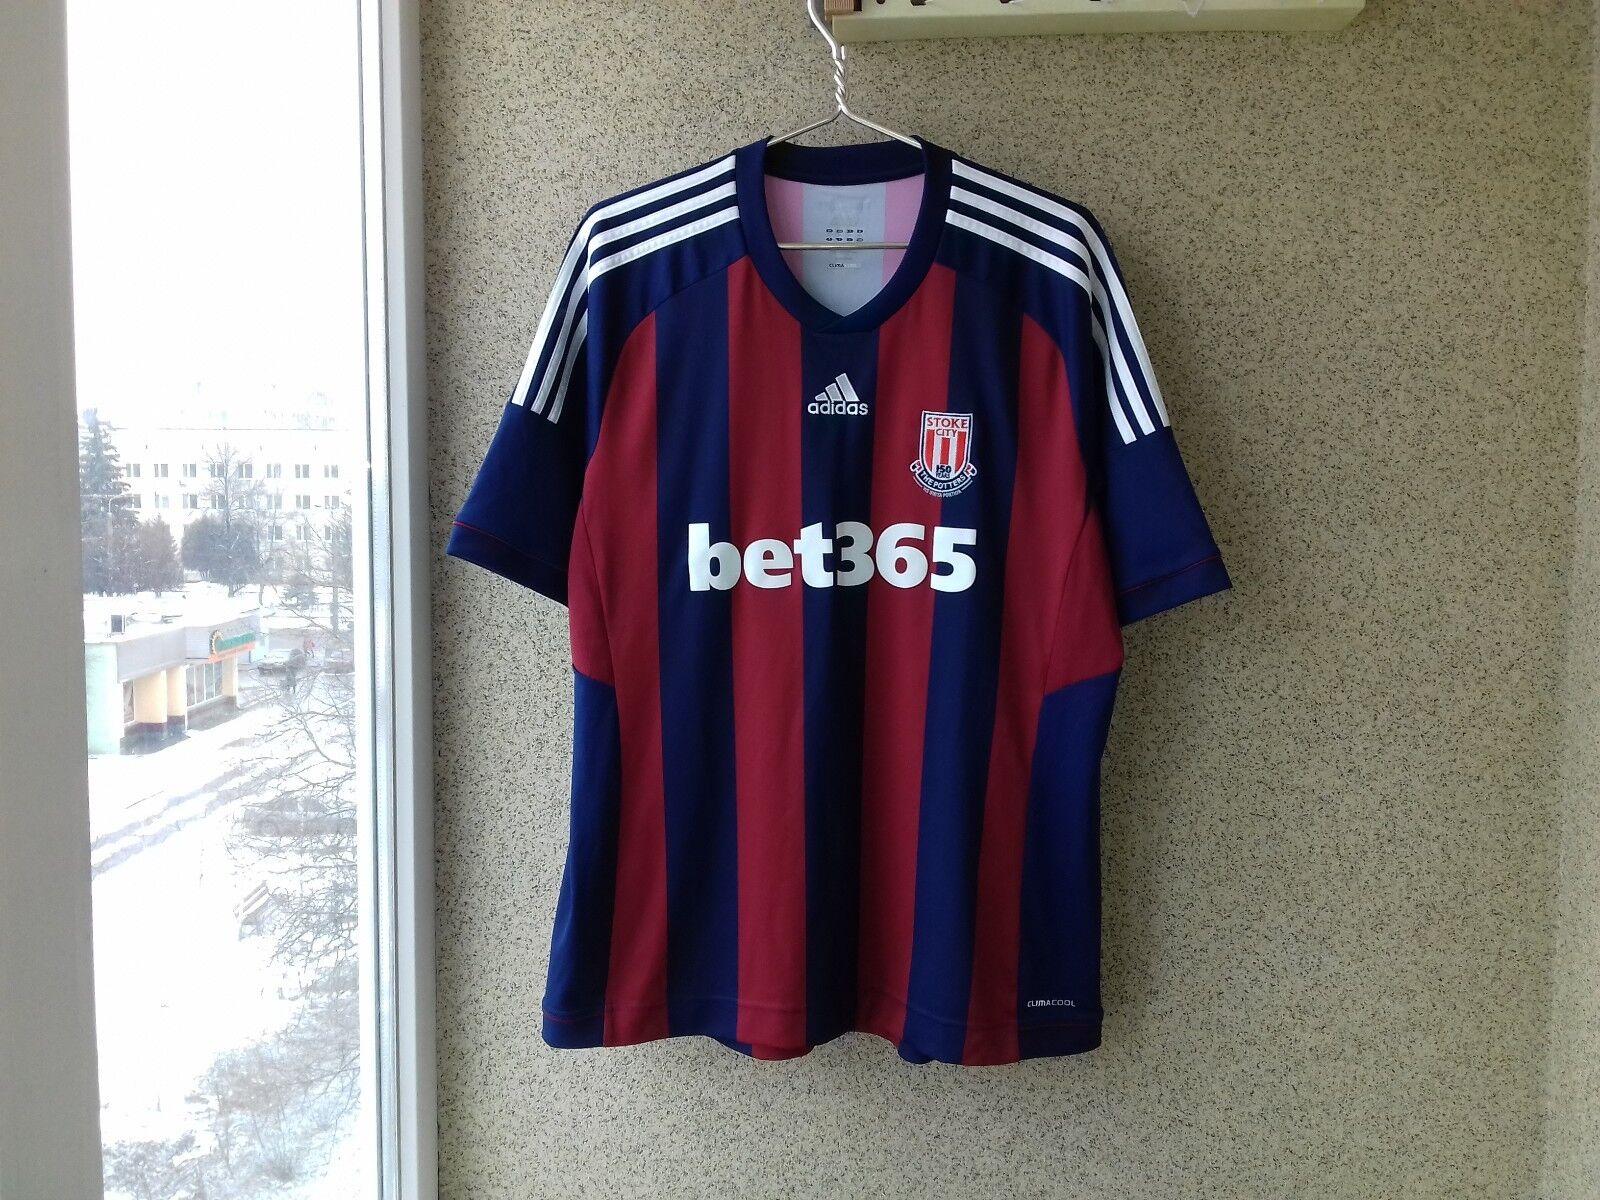 Stoke City 2012 2013 Away football shirt Adidas Jersey Soccer Camiseta England